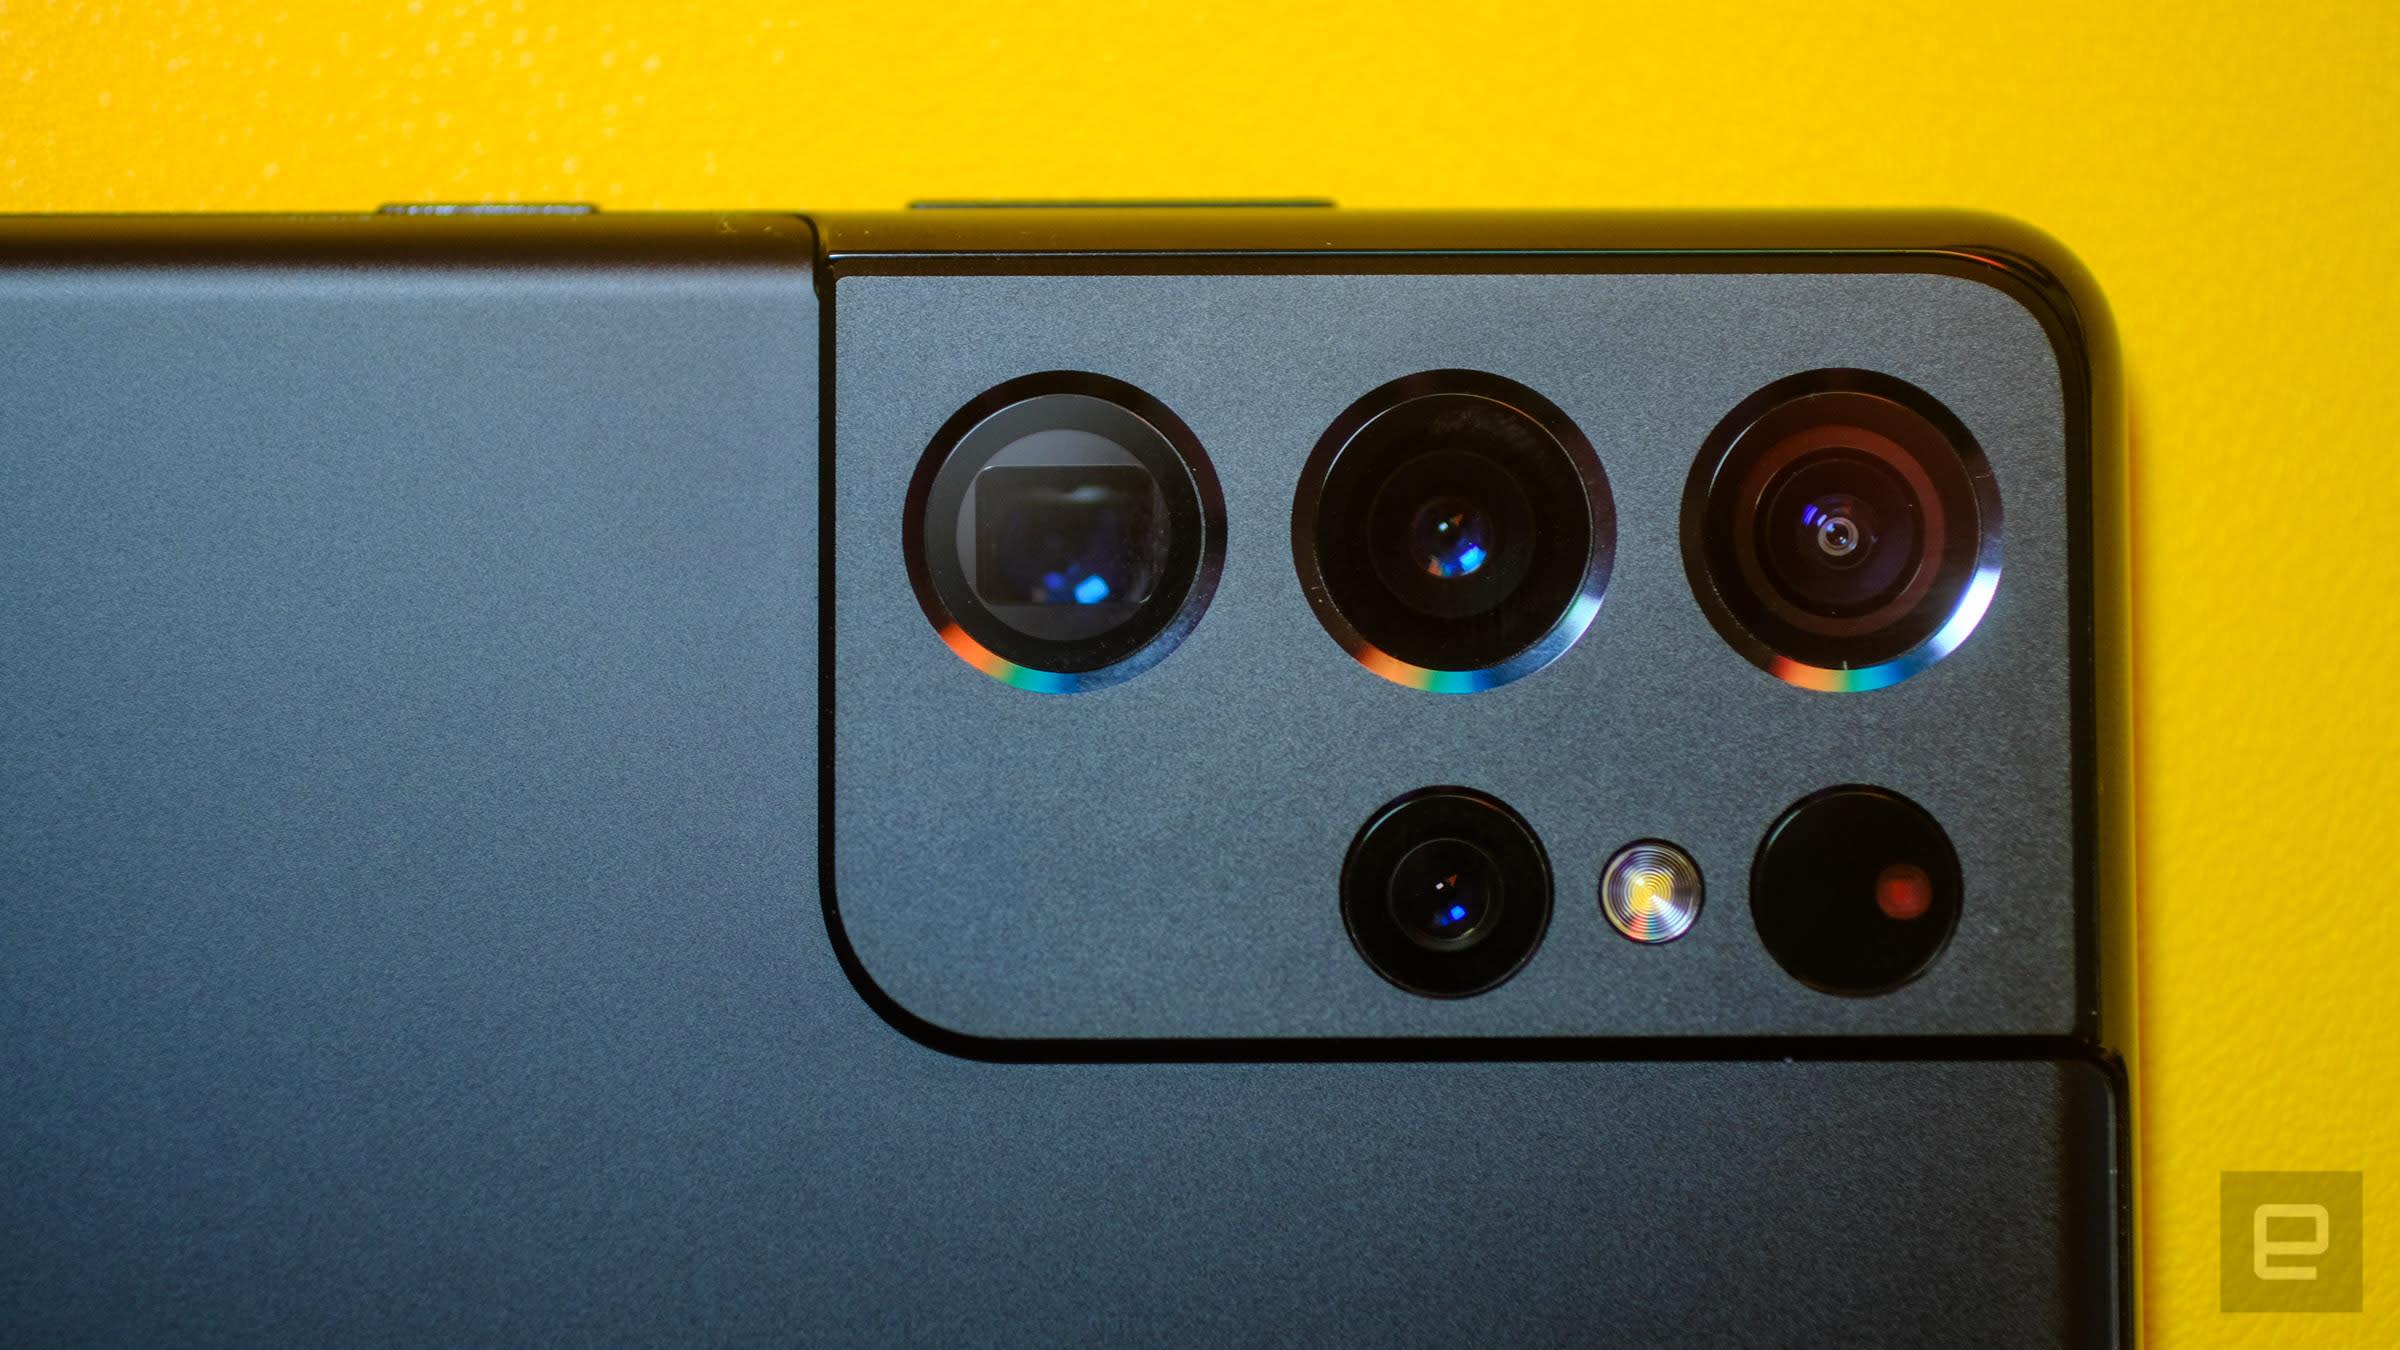 Samsung Galaxy S21 Ultra review photos